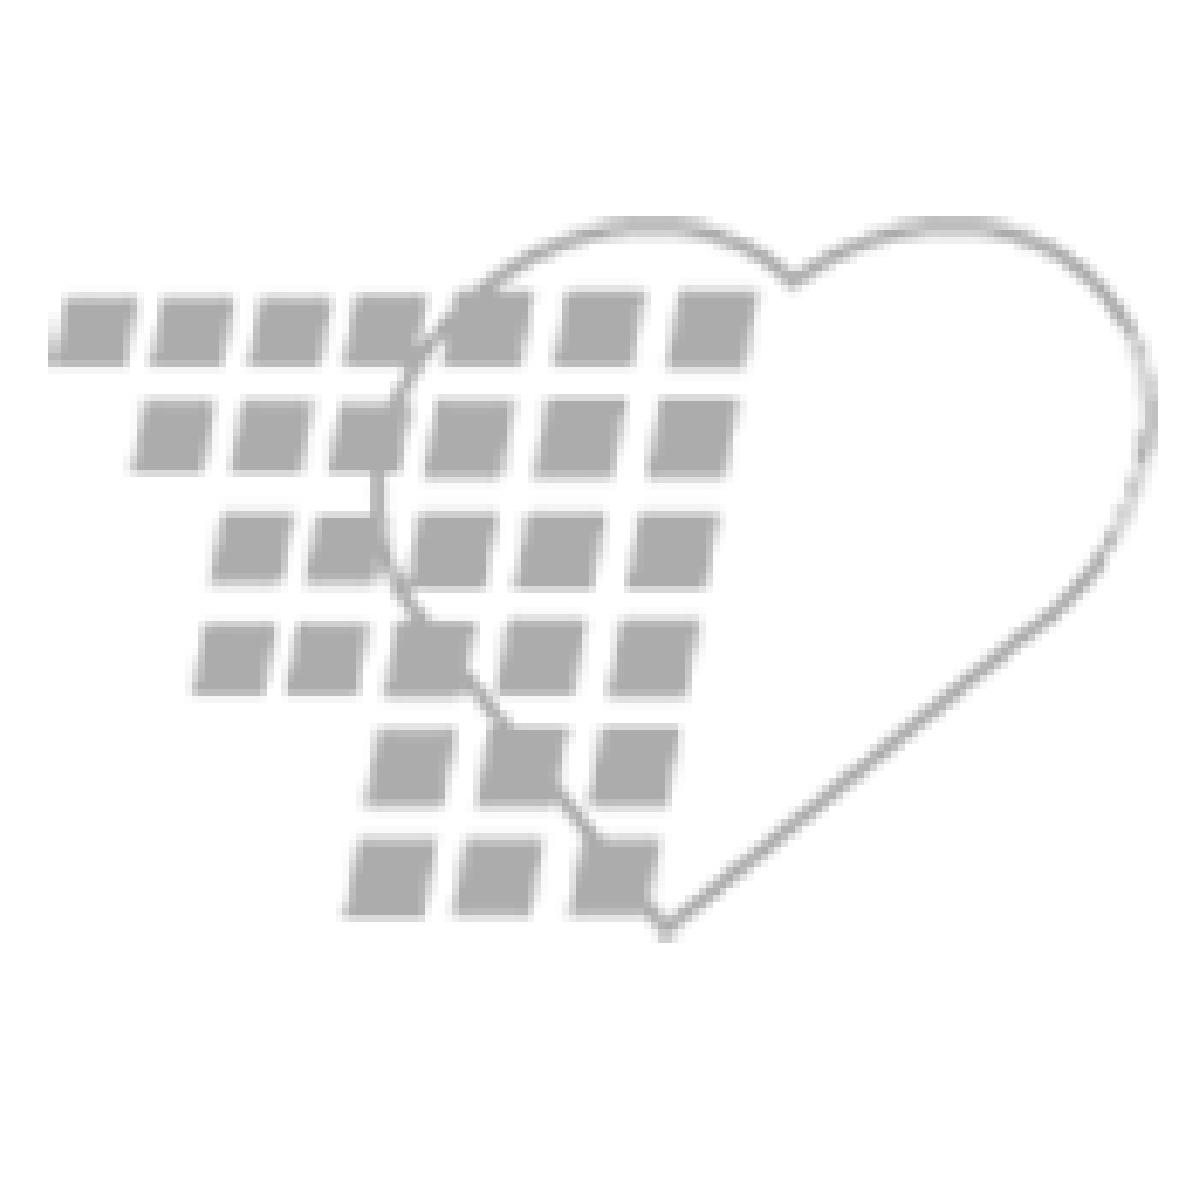 02-92-0047 Goniometer